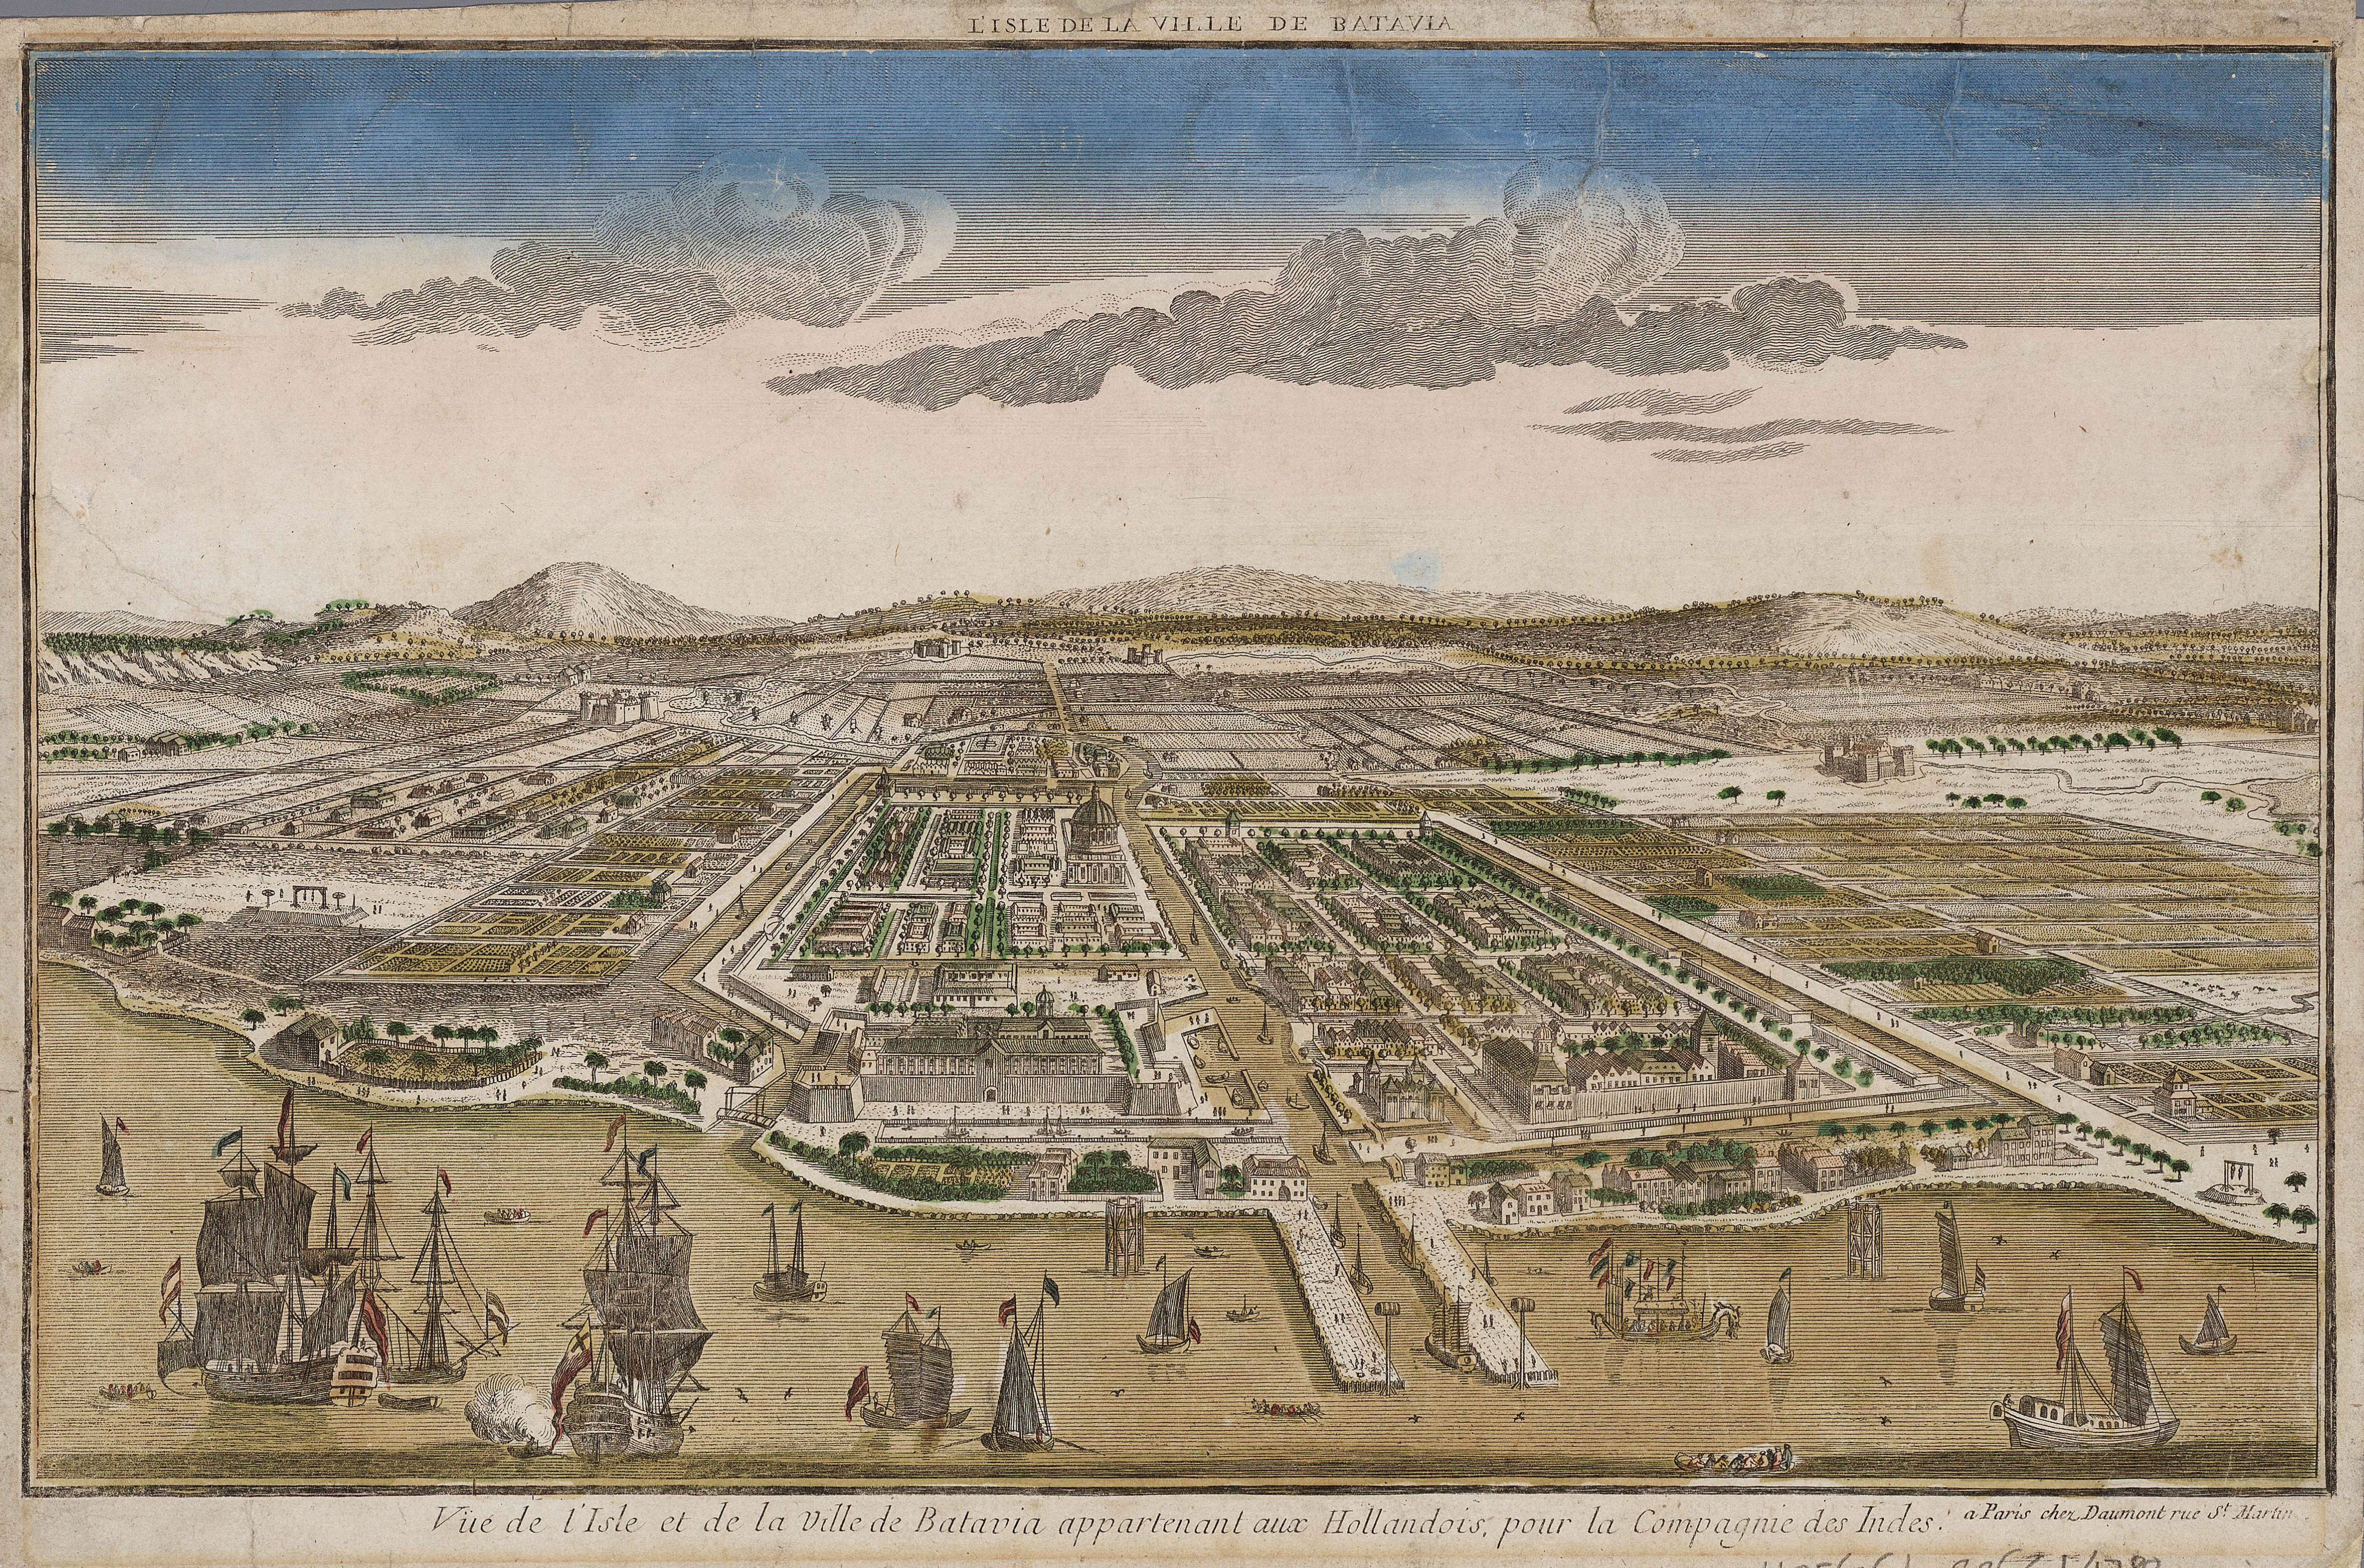 File:Batavia um 1780.jpeg